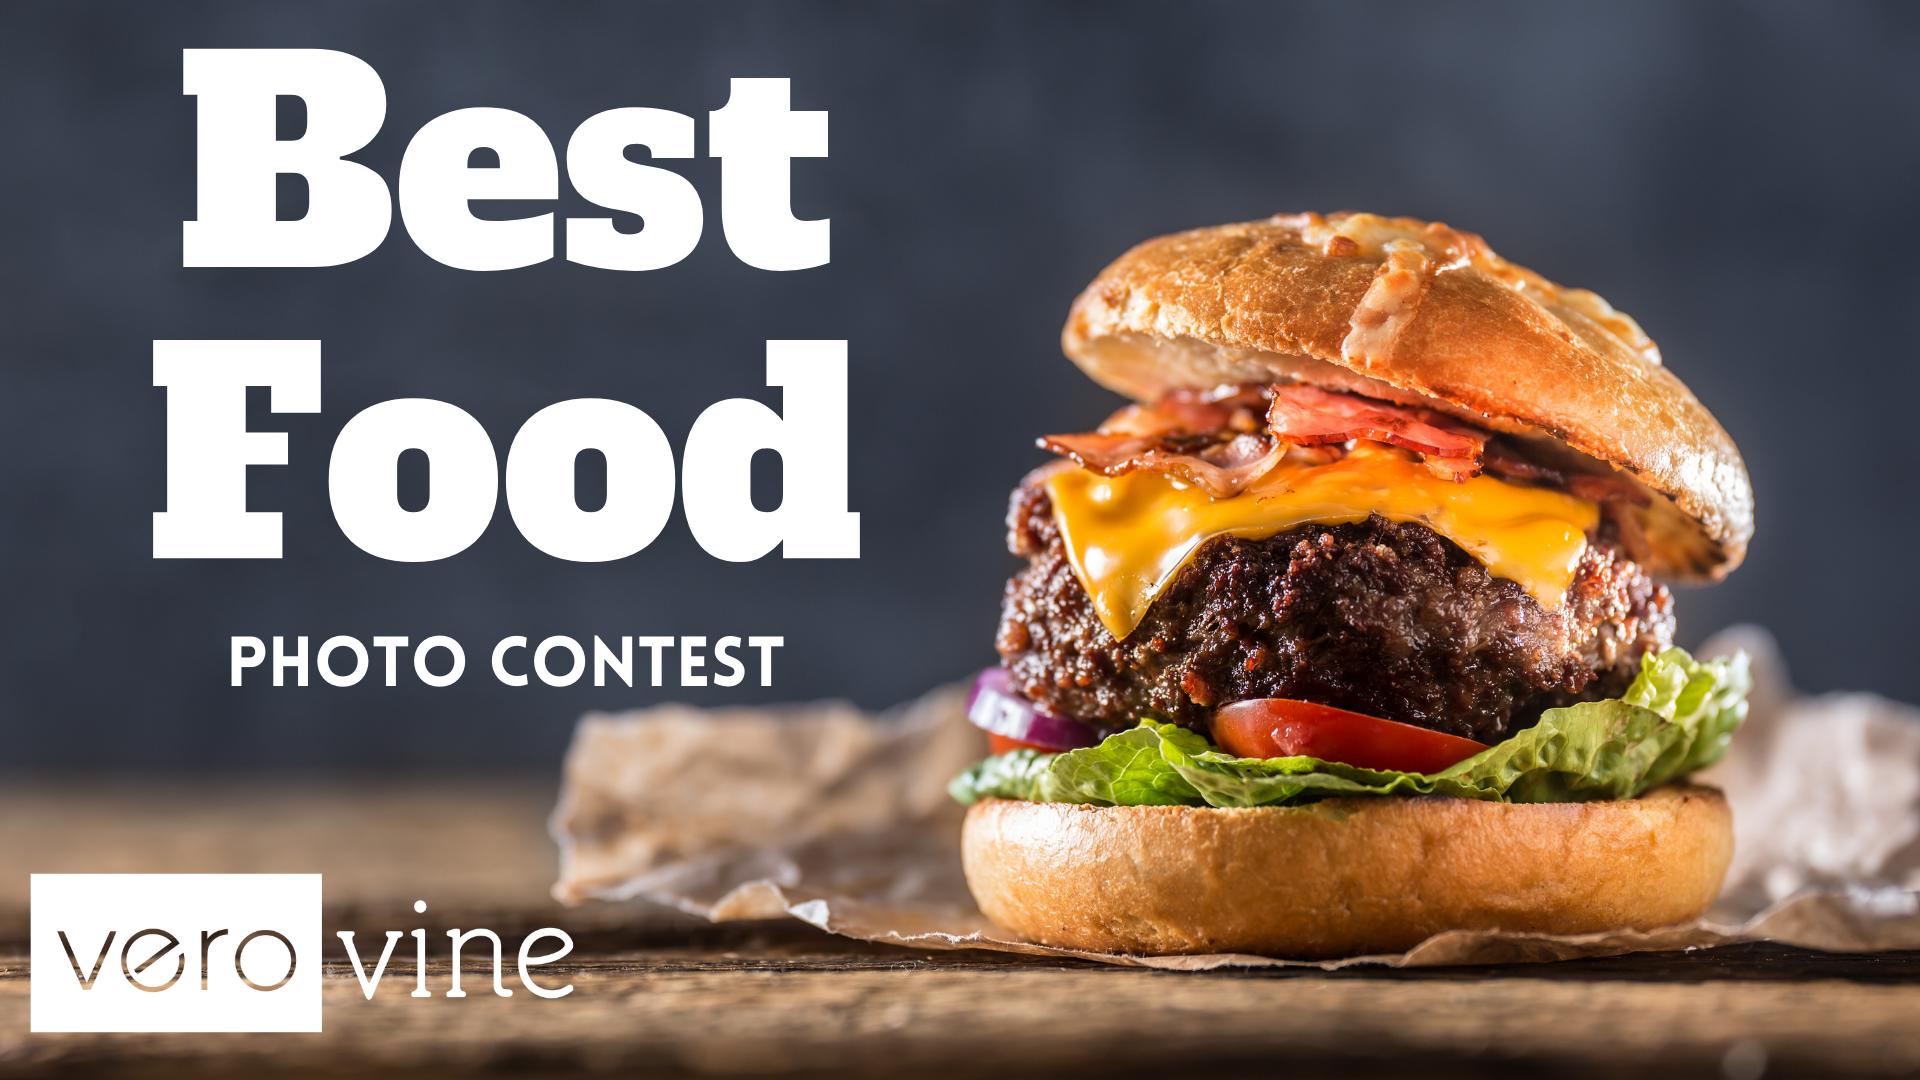 Best Food Photo Contest 2021